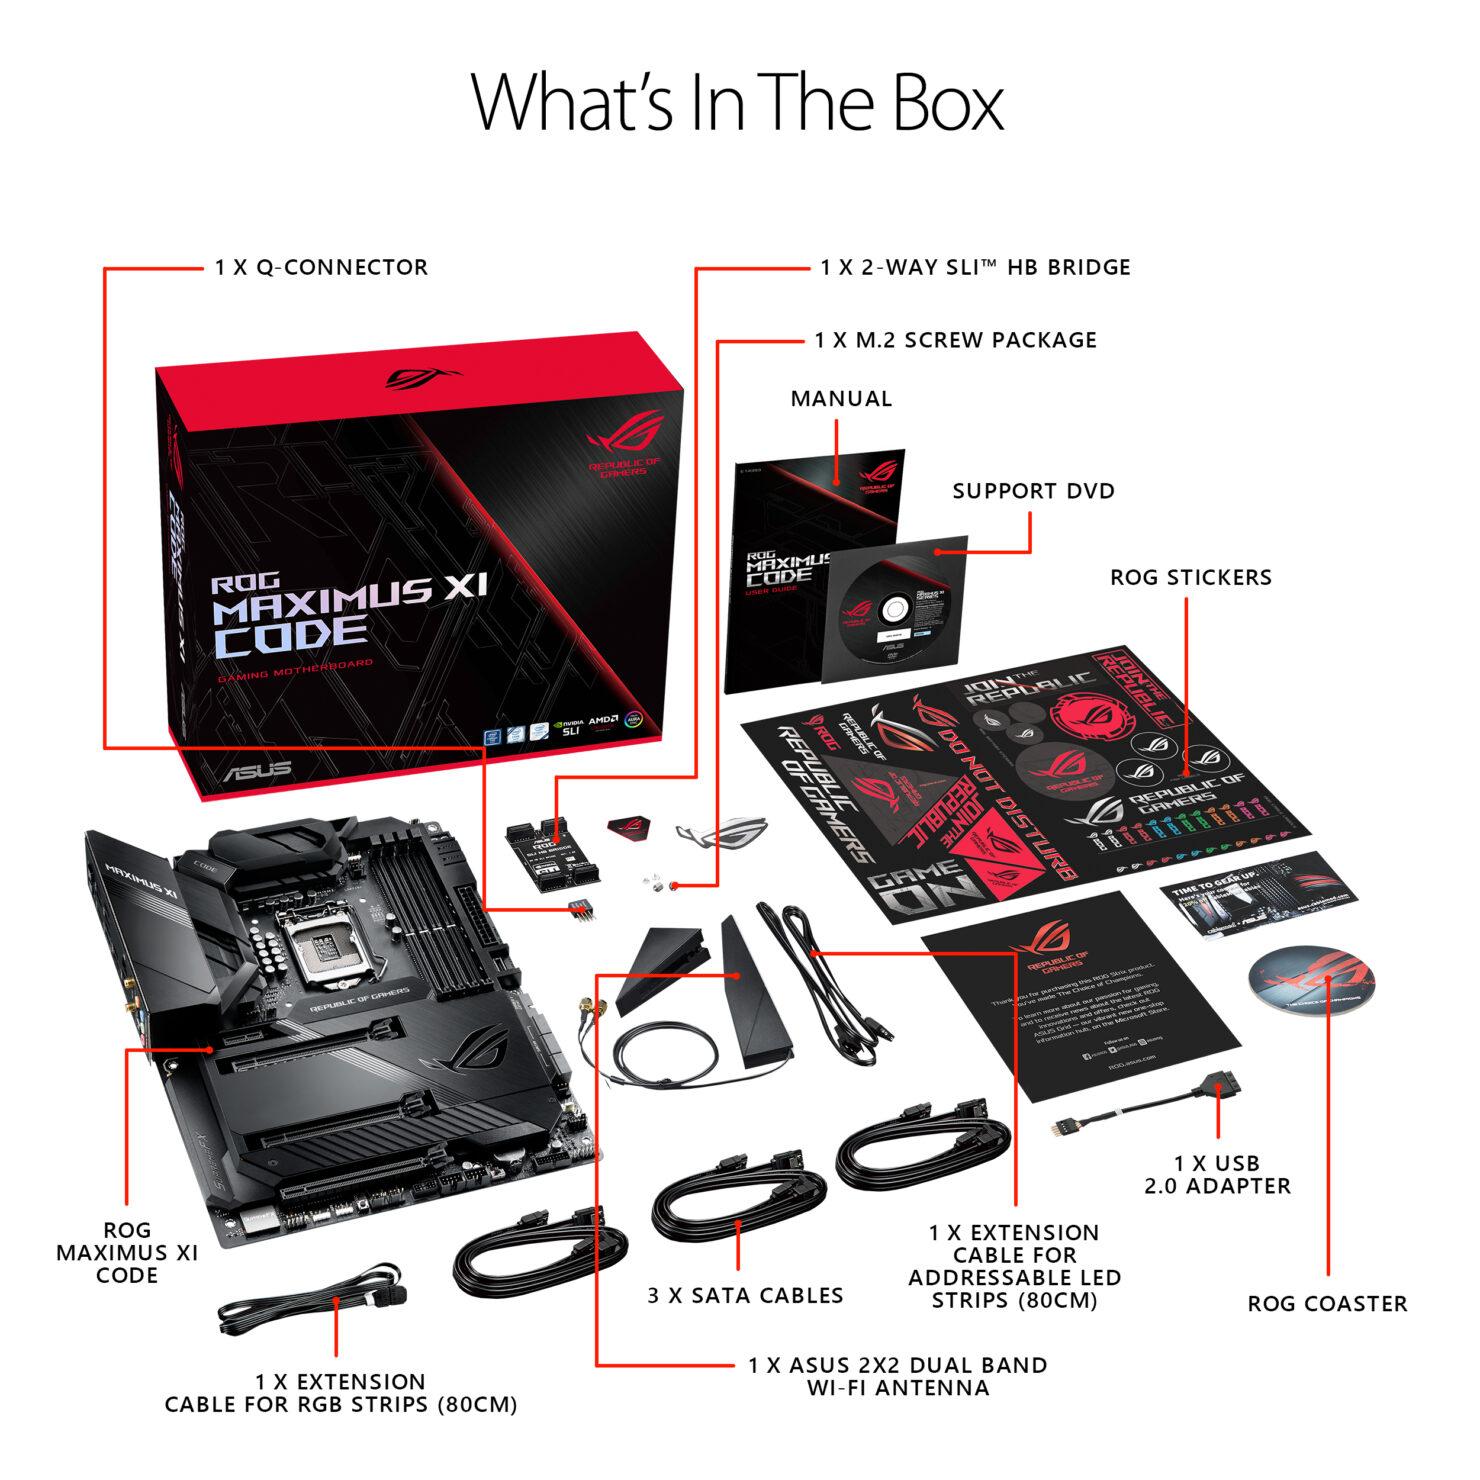 6-rog-maximus-xi-code-whats-in-the-box